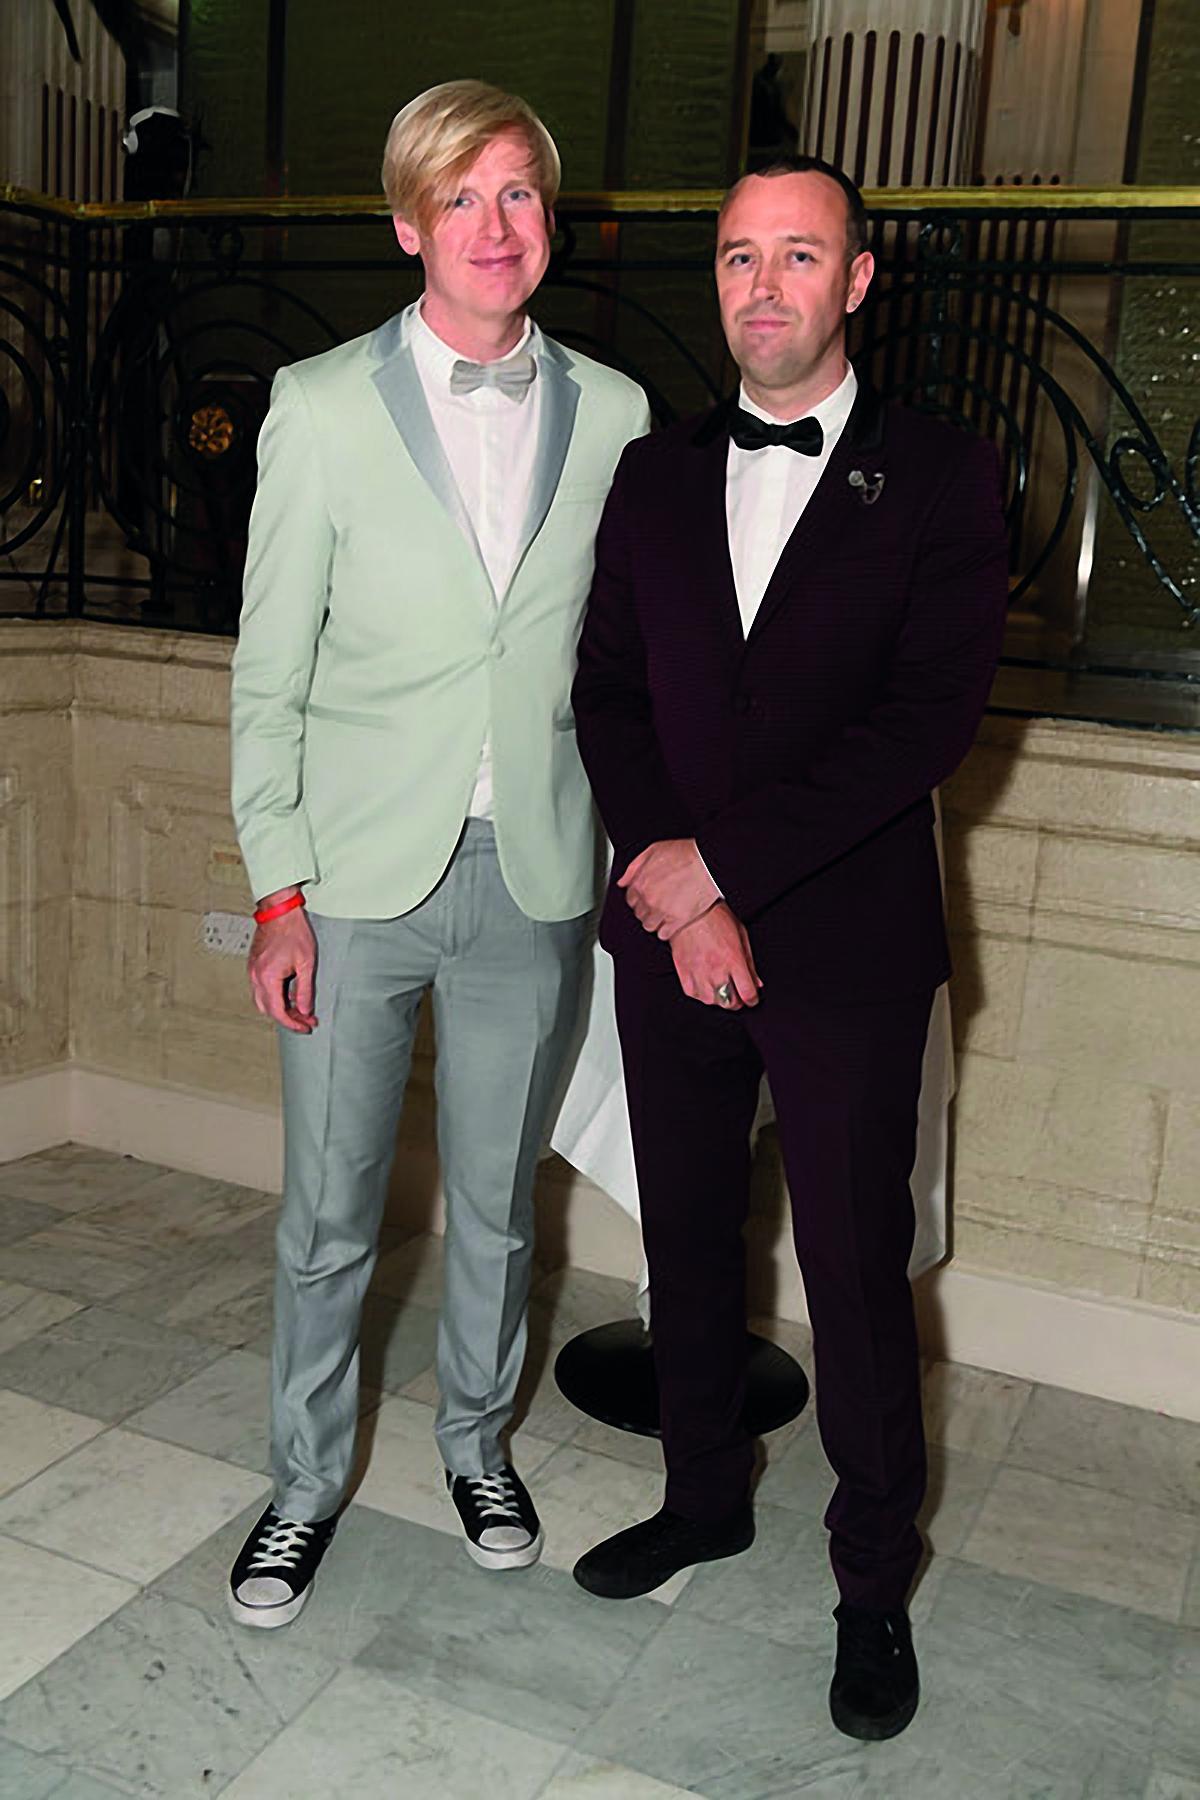 Pride Power List: Sir Ian McKellen and Munroe Bergdorf among